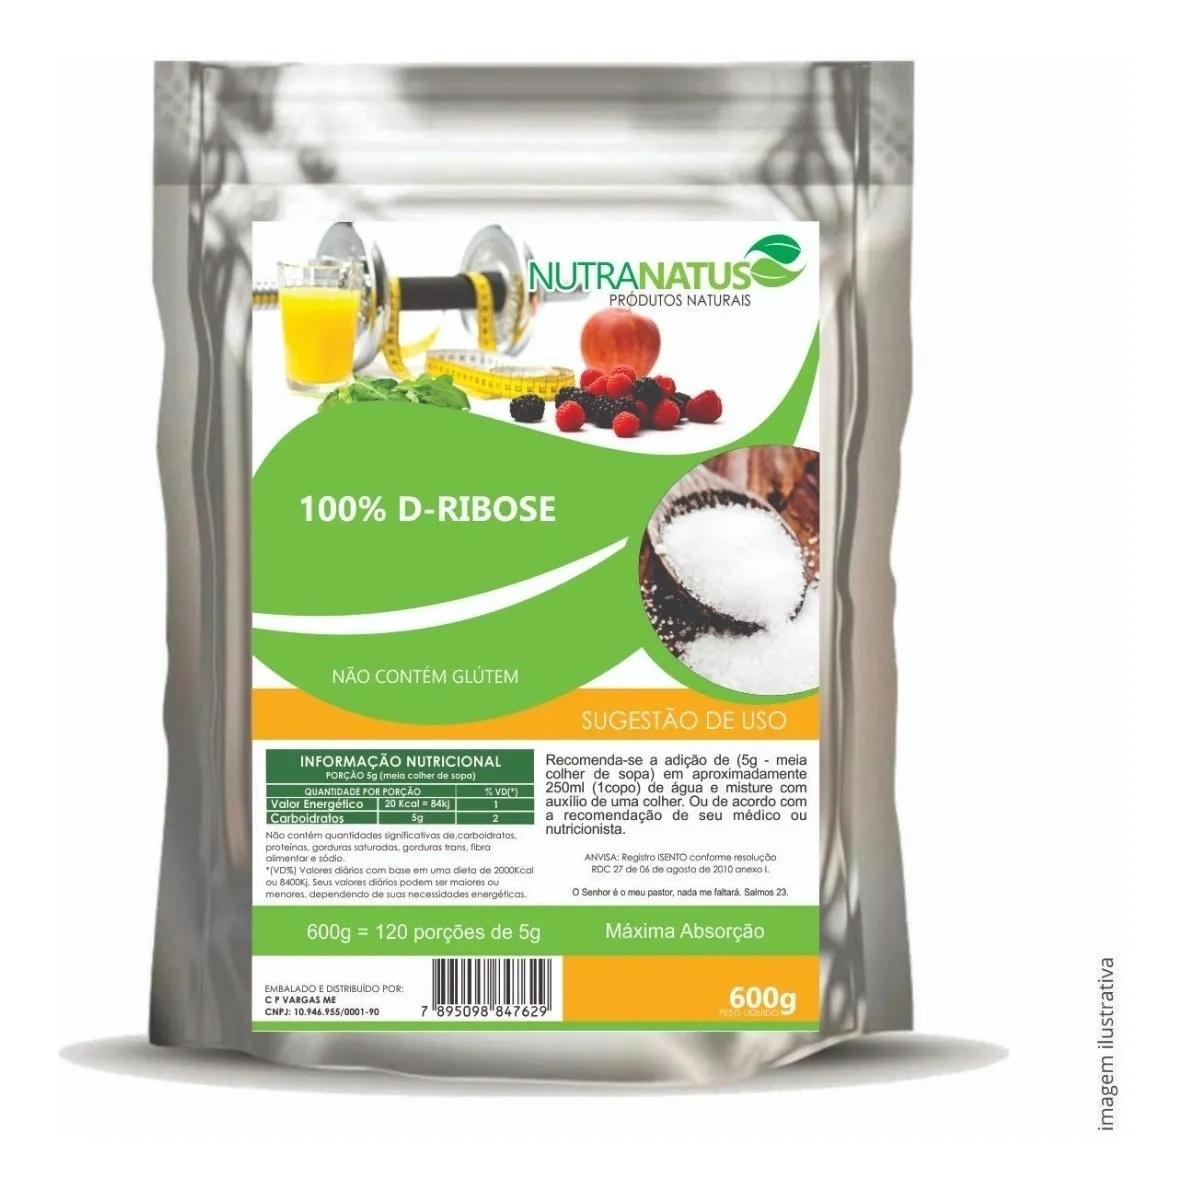 D-ribose Pura 1kg Importada + Brinde